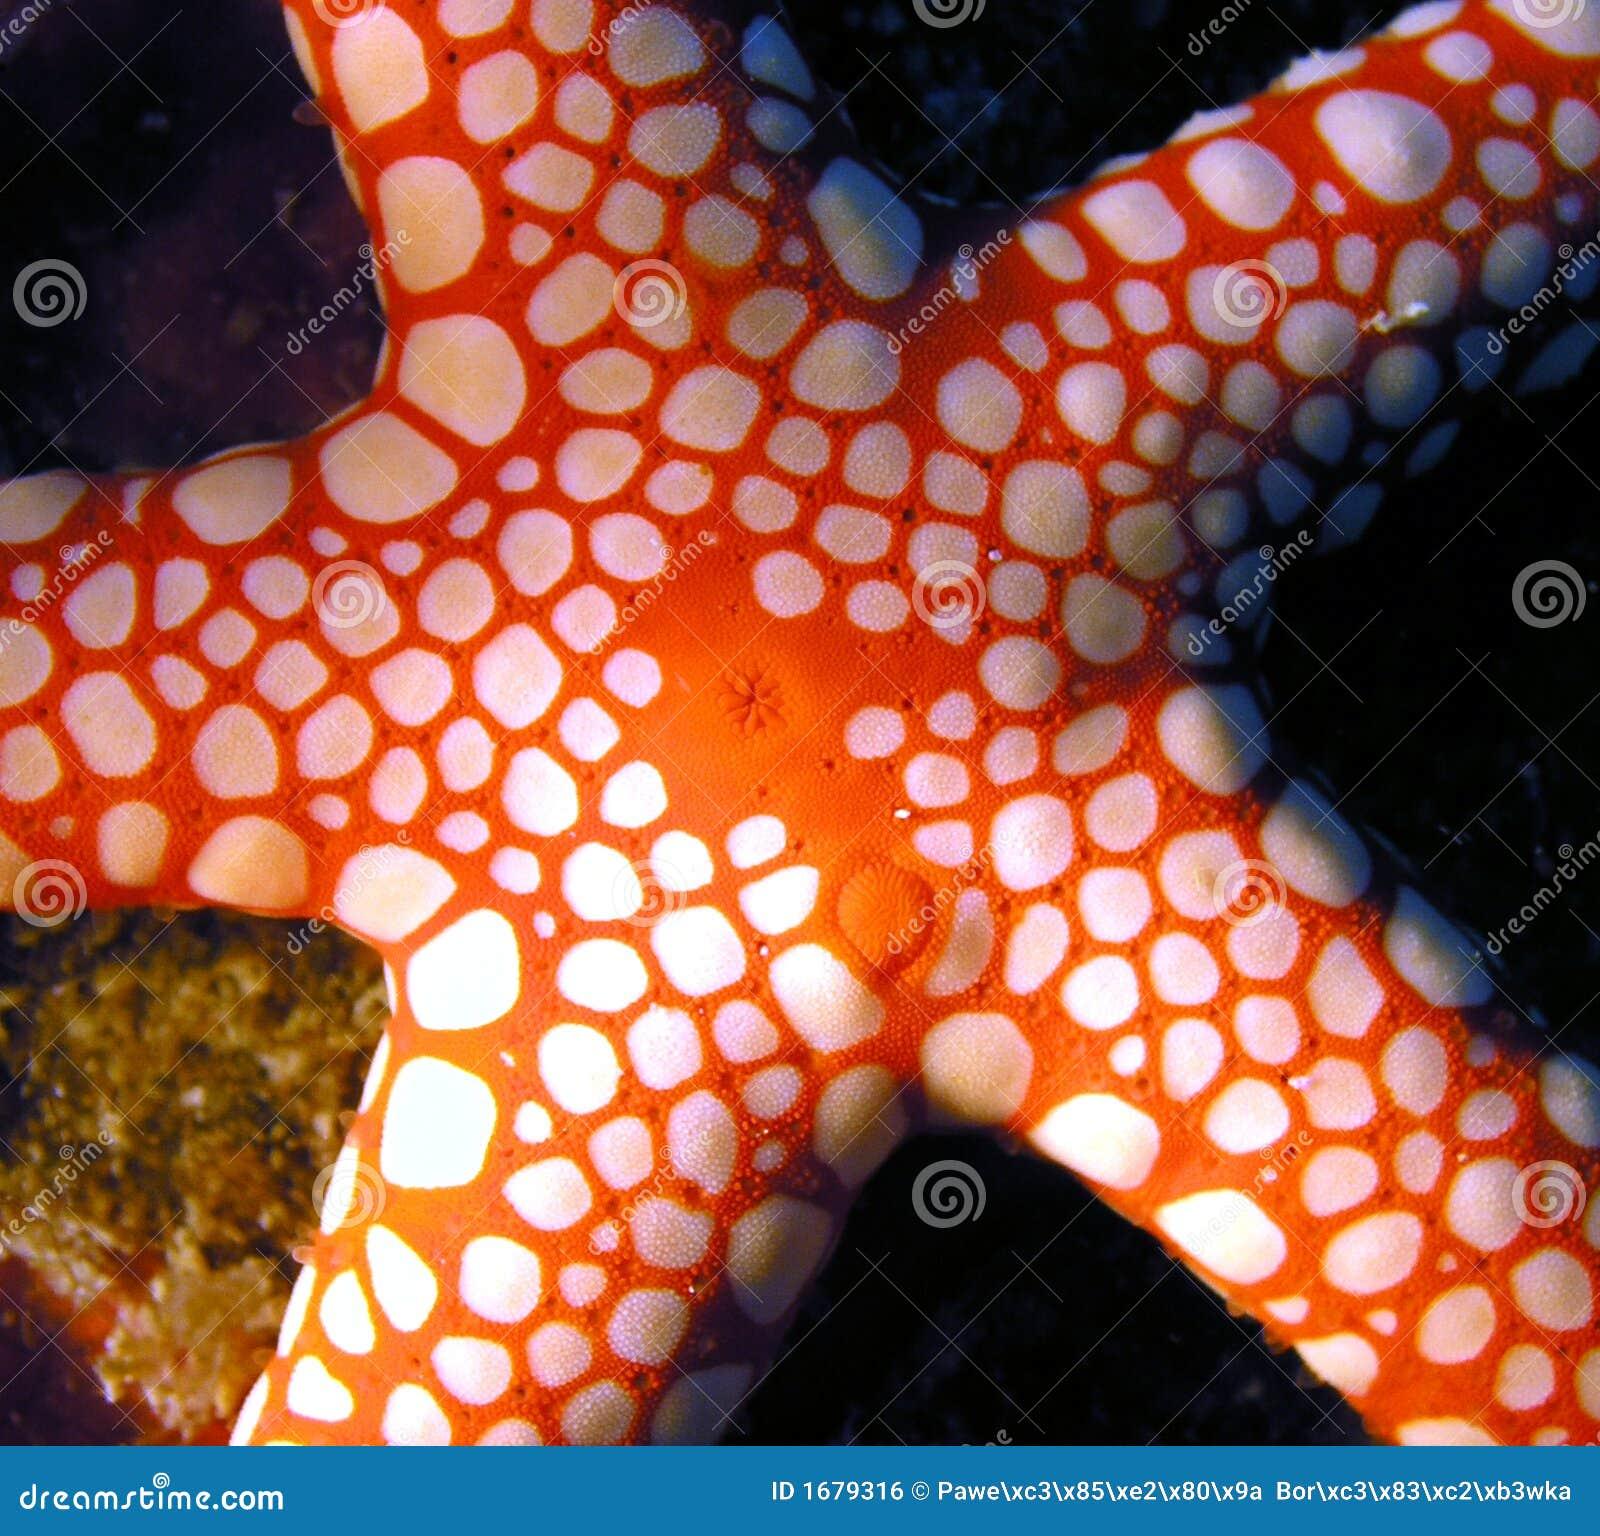 Red Sea Seastar fish